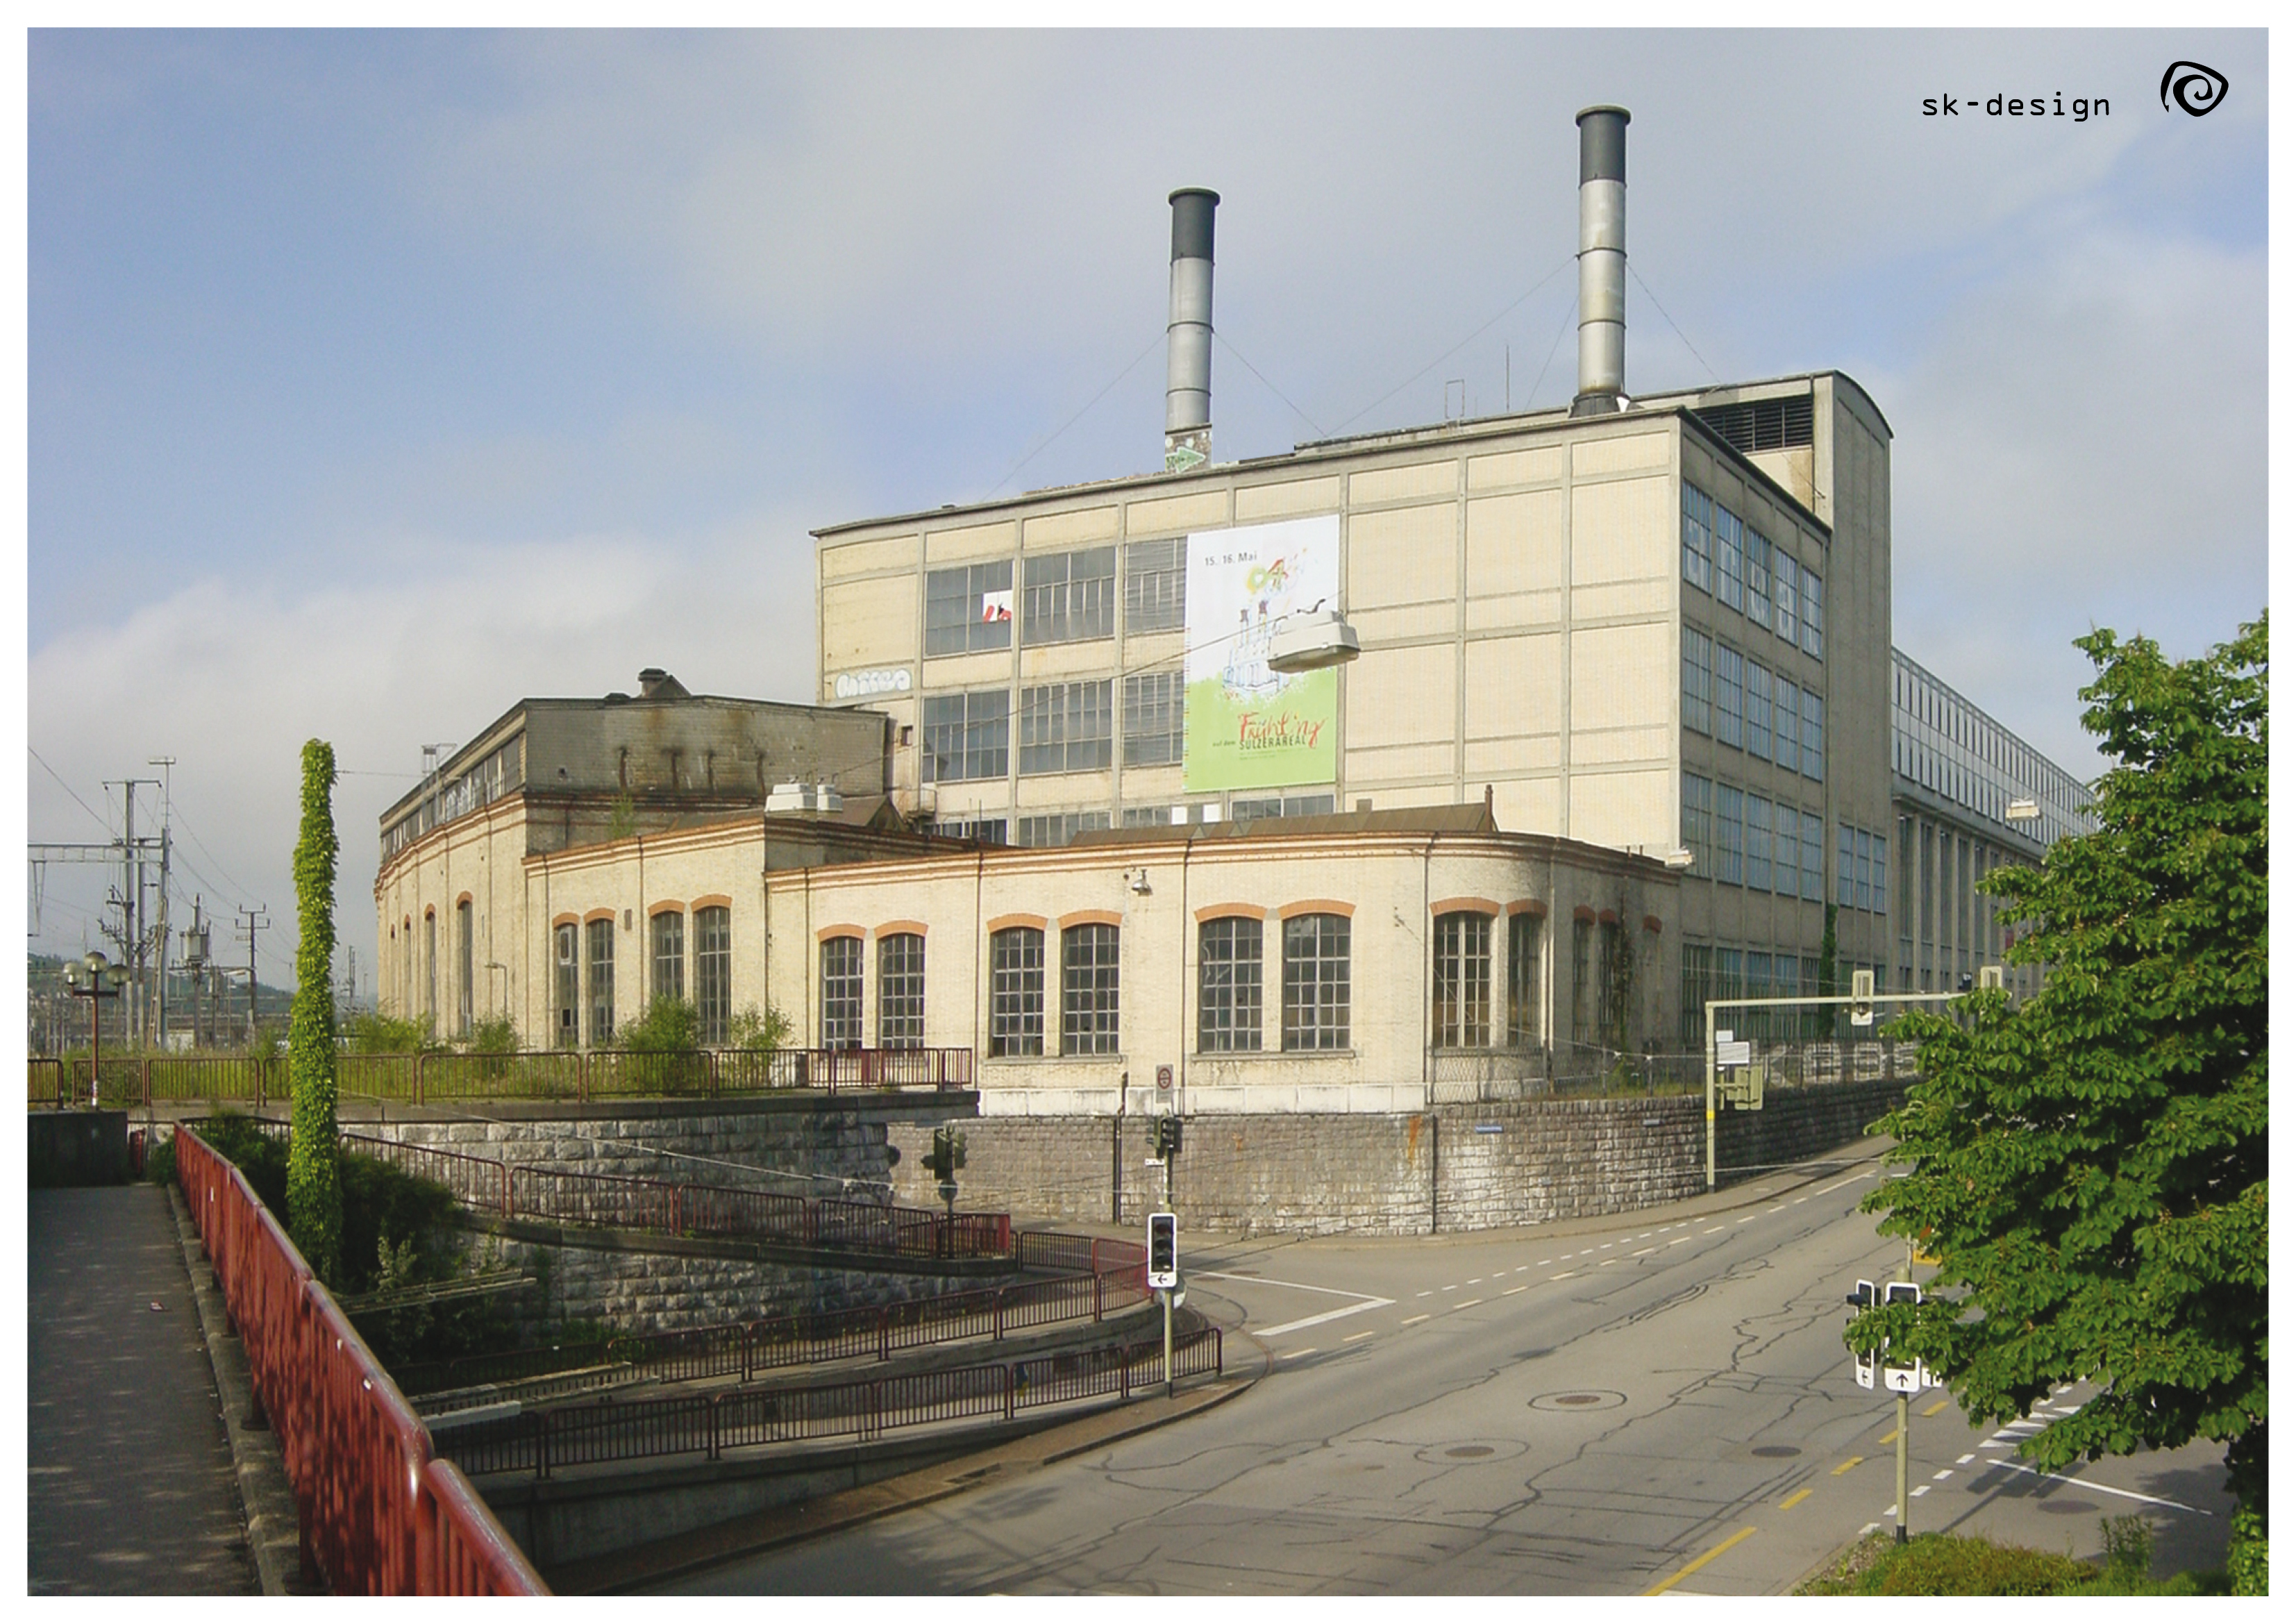 1409-Kesselhaus22.jpg